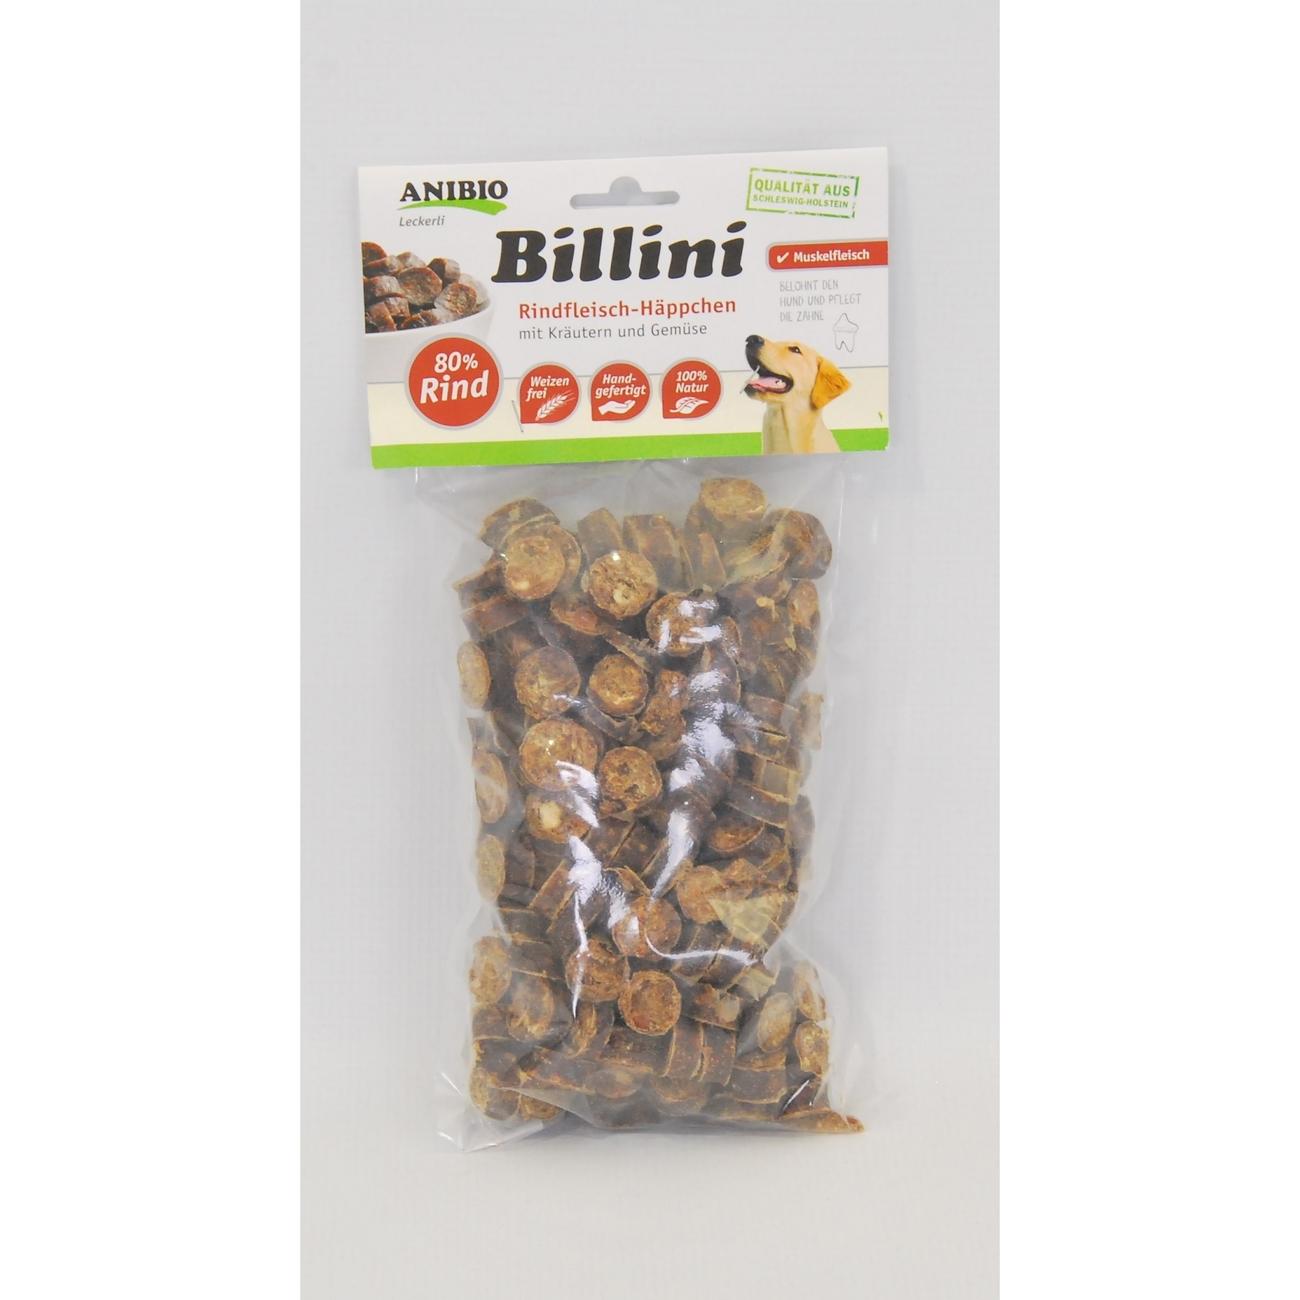 Anibio Billini Rind, Bild 3